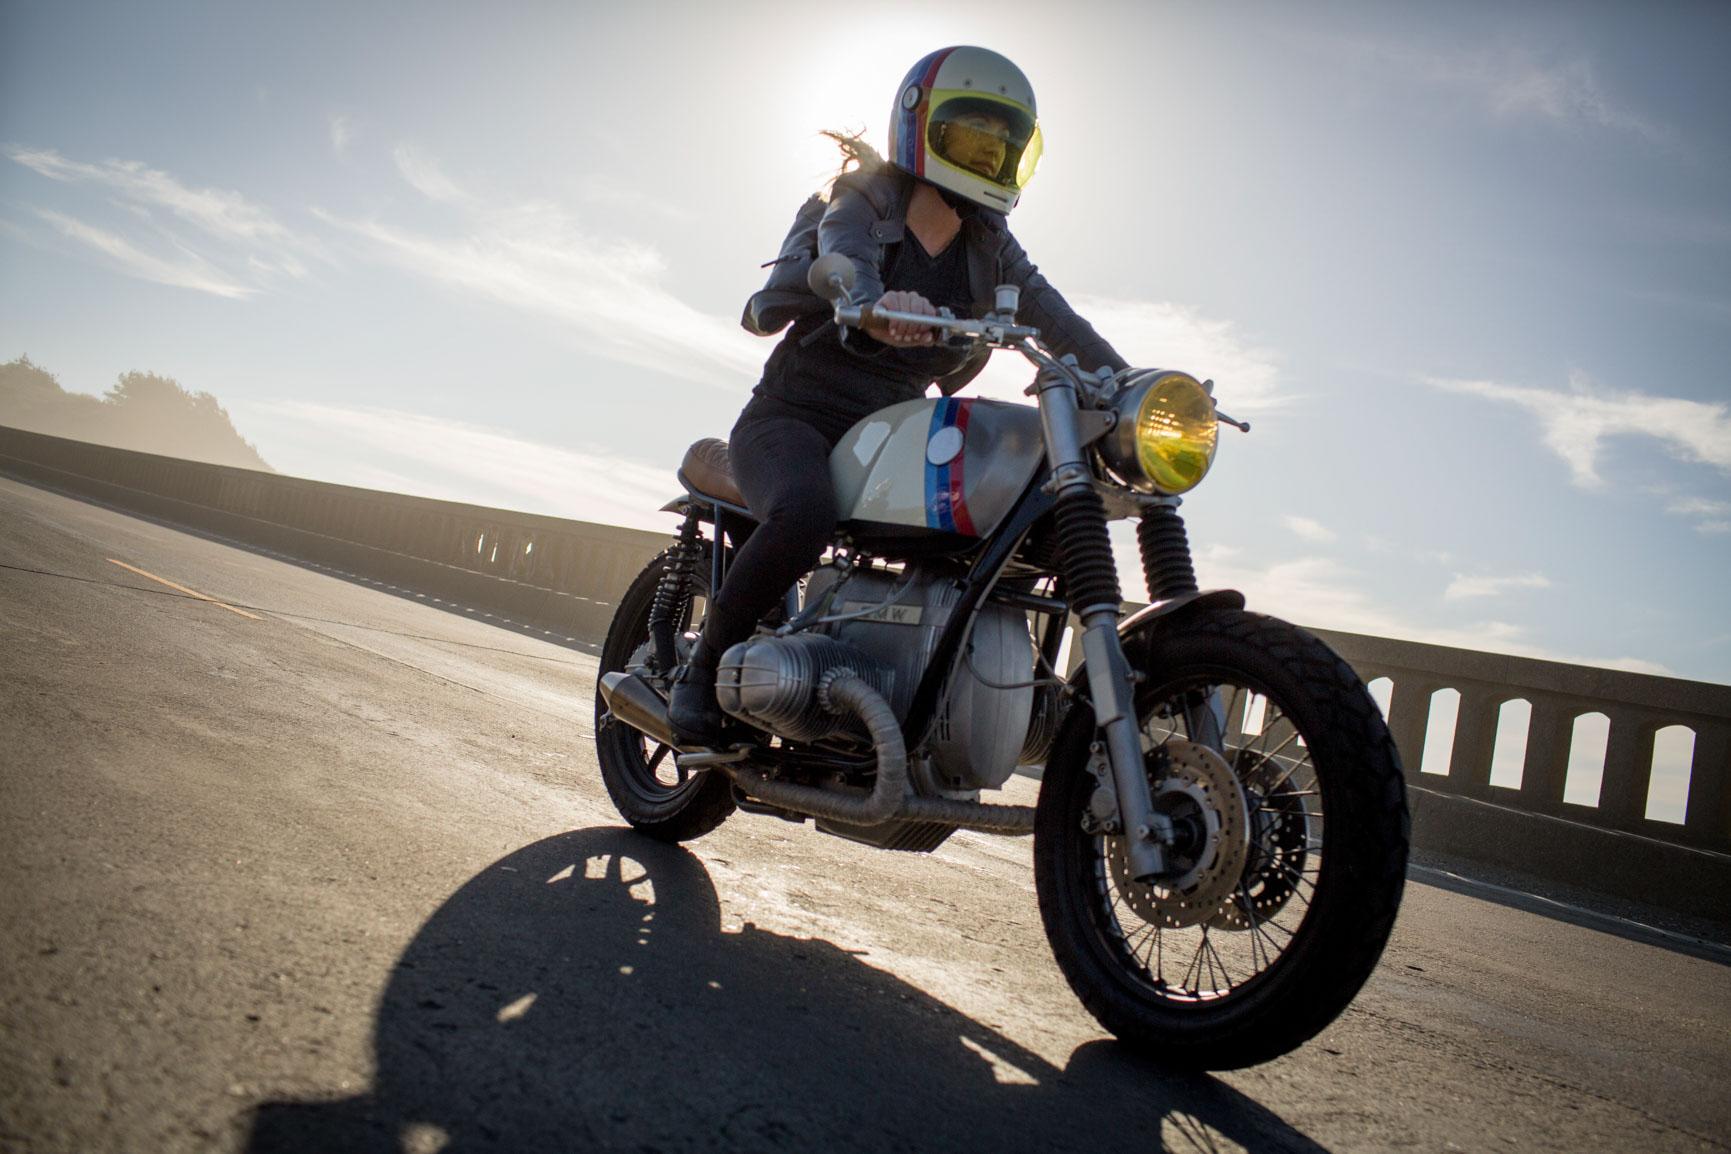 TN - National University - 2017.10.24 - 02571 - Motorcycle.jpg